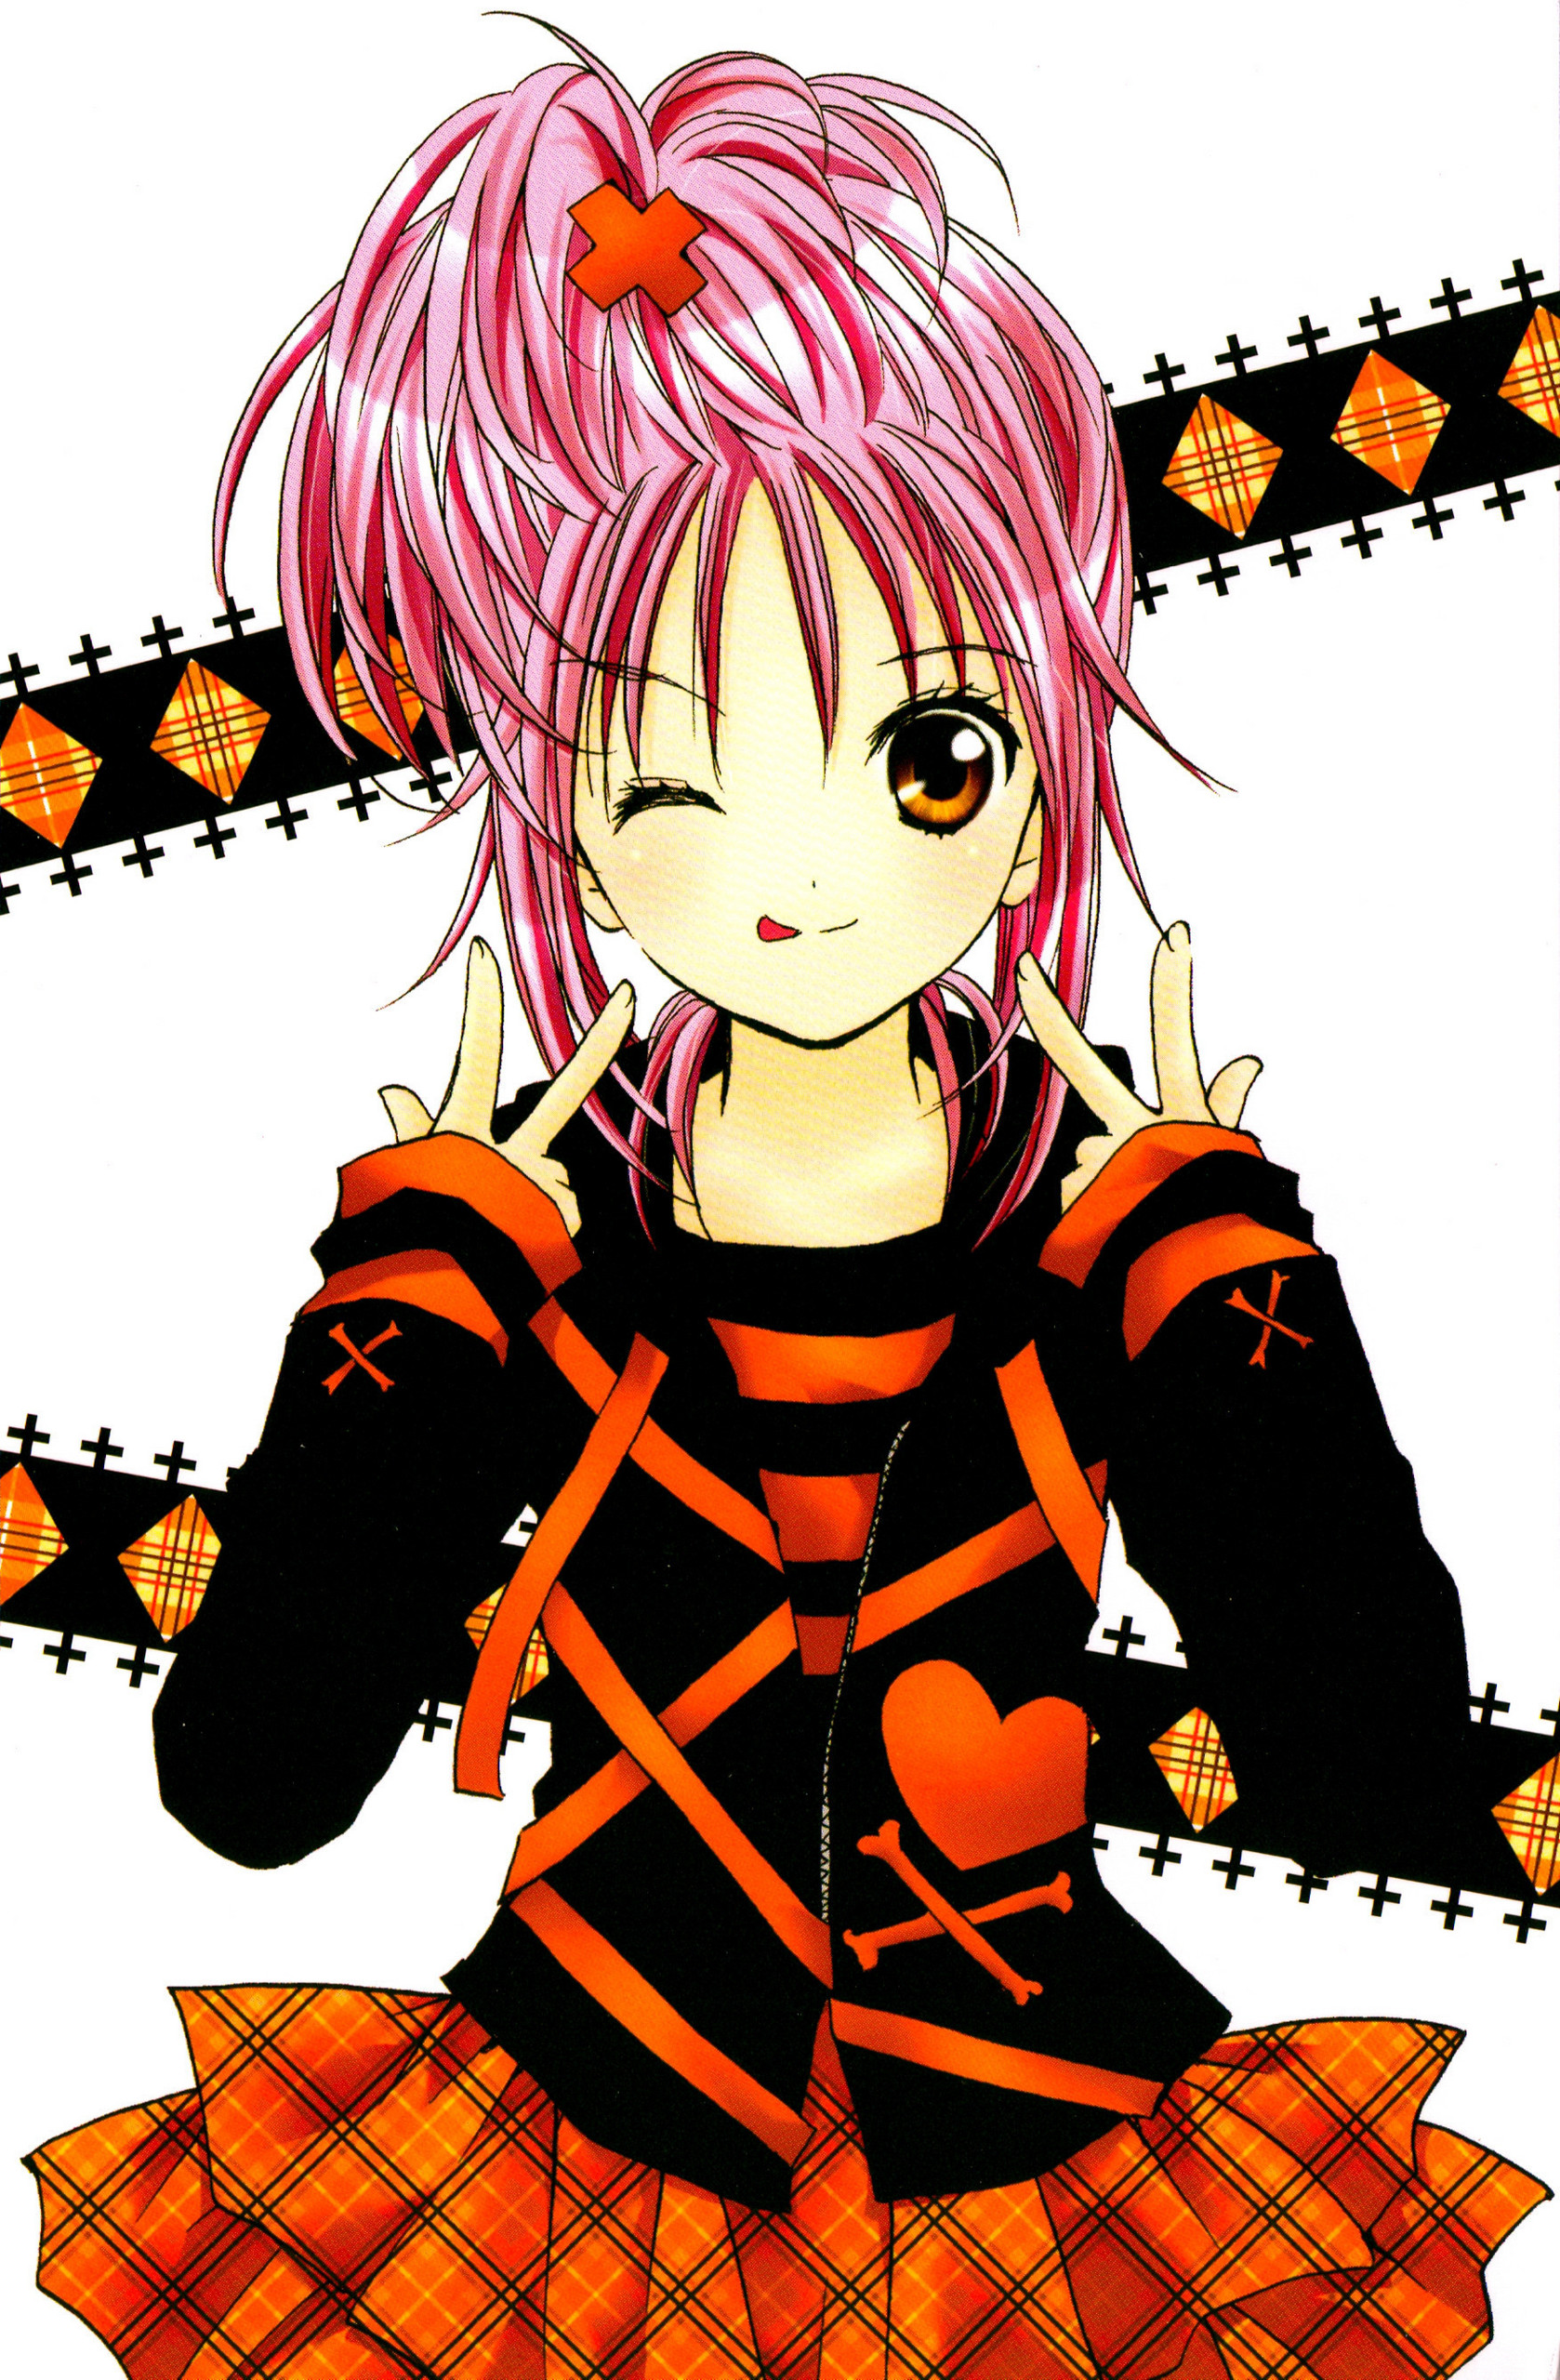 Postcard - Shugo Chara Manga Photo (9138601) - Fanpop